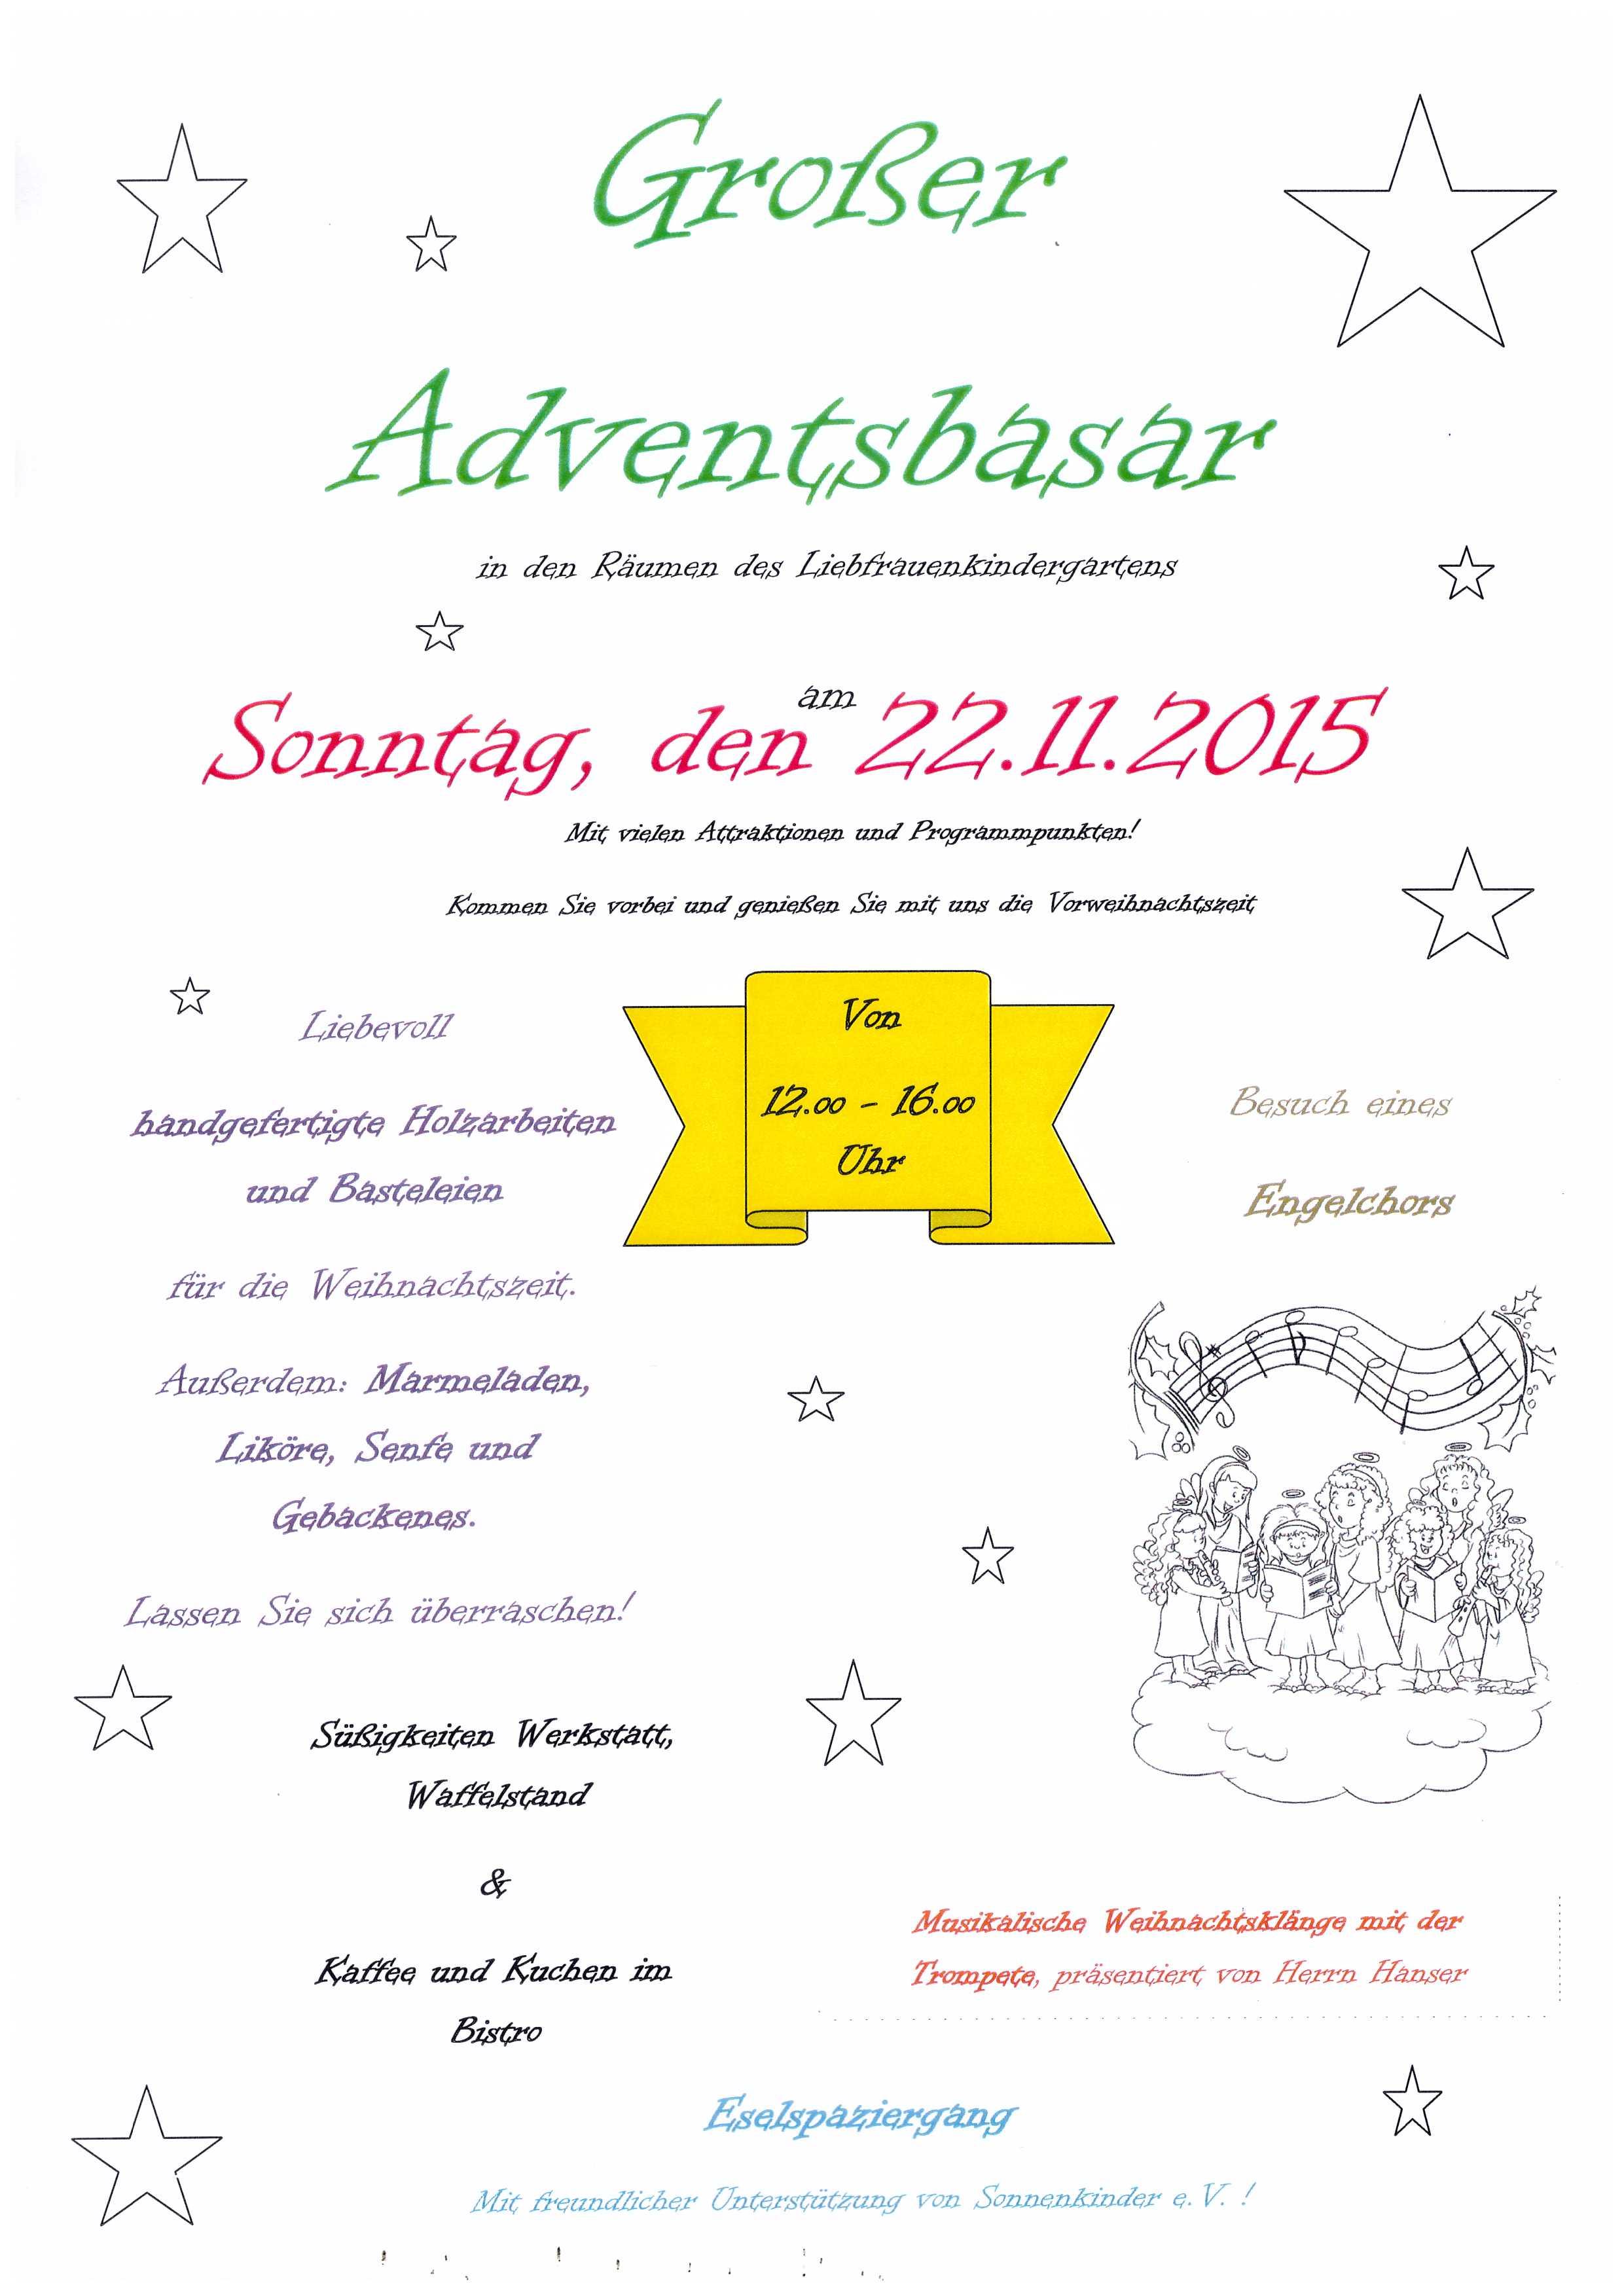 Adventsbasar 2015 Plakat